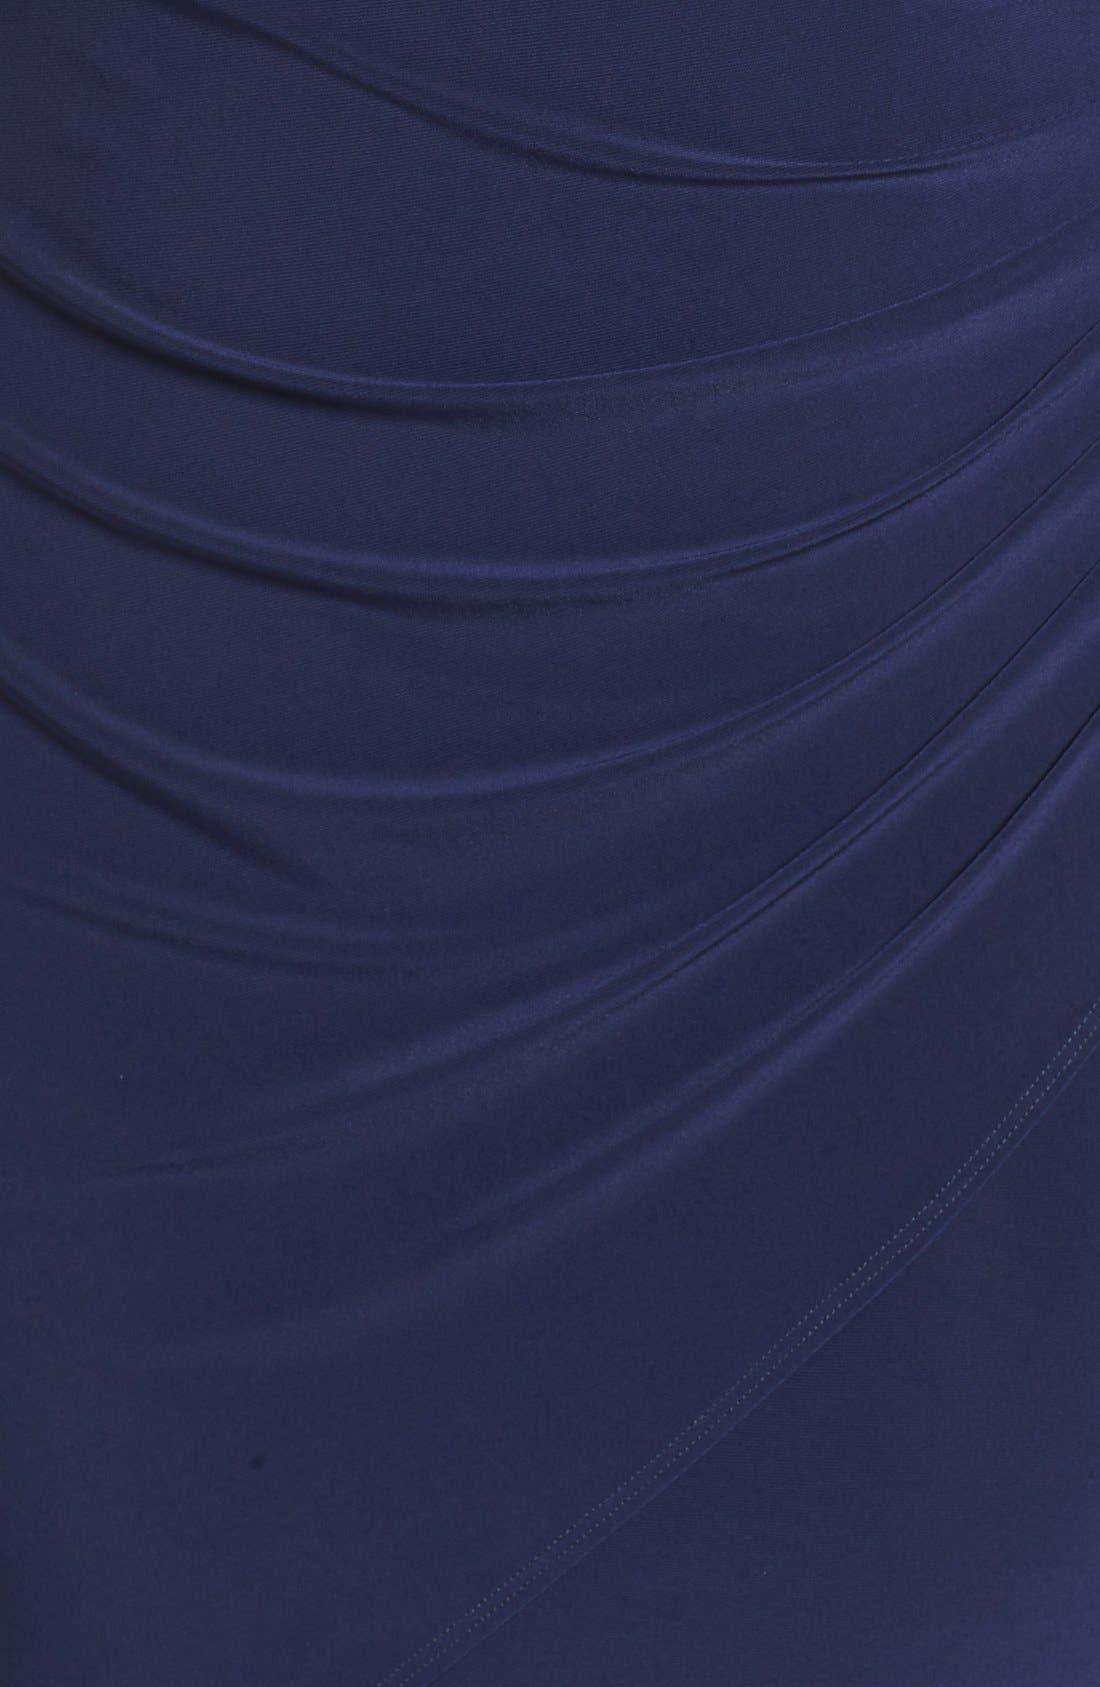 Embellished Faux Wrap Dress,                             Alternate thumbnail 12, color,                             410